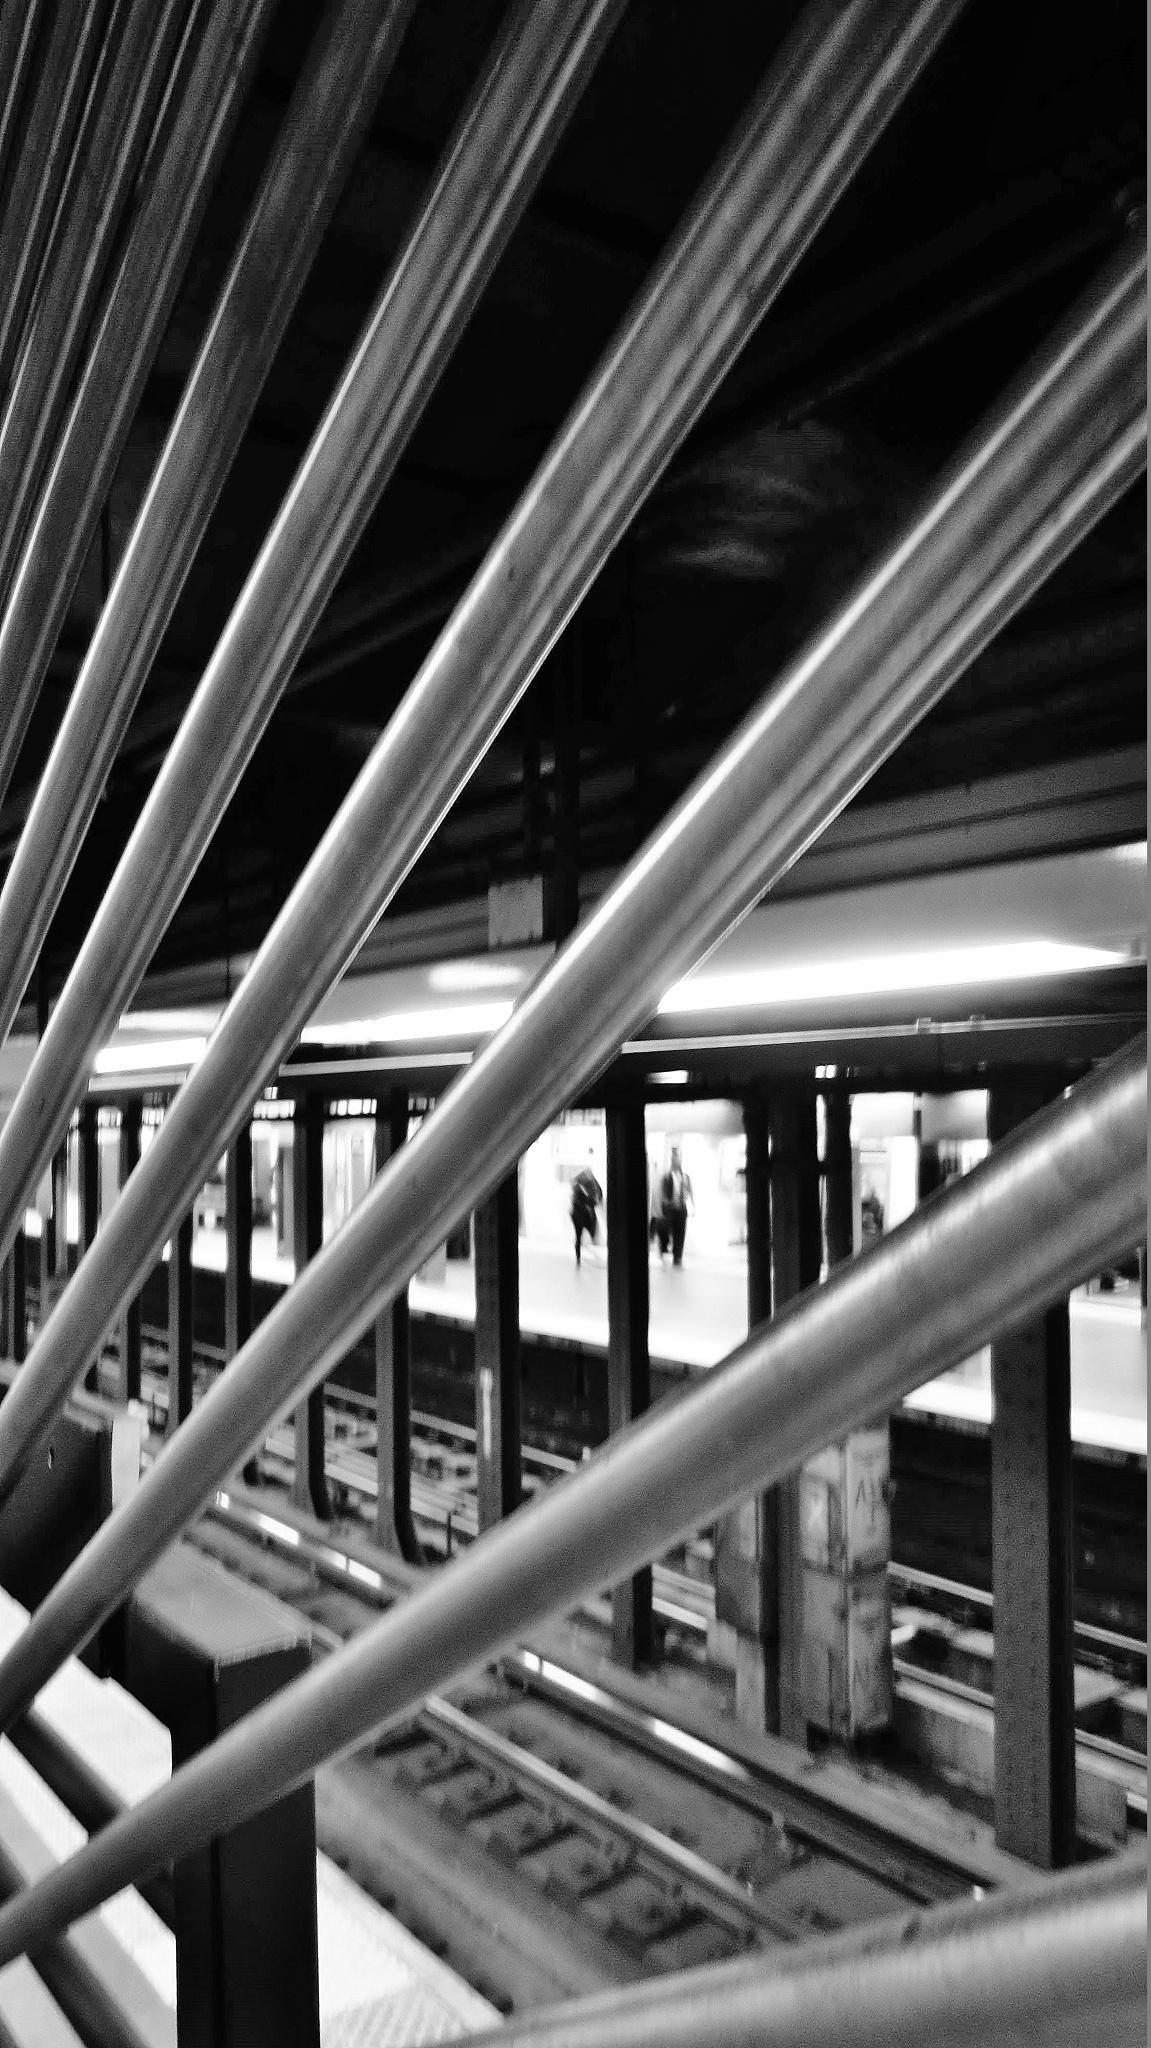 Transiting Lines by cgsahar